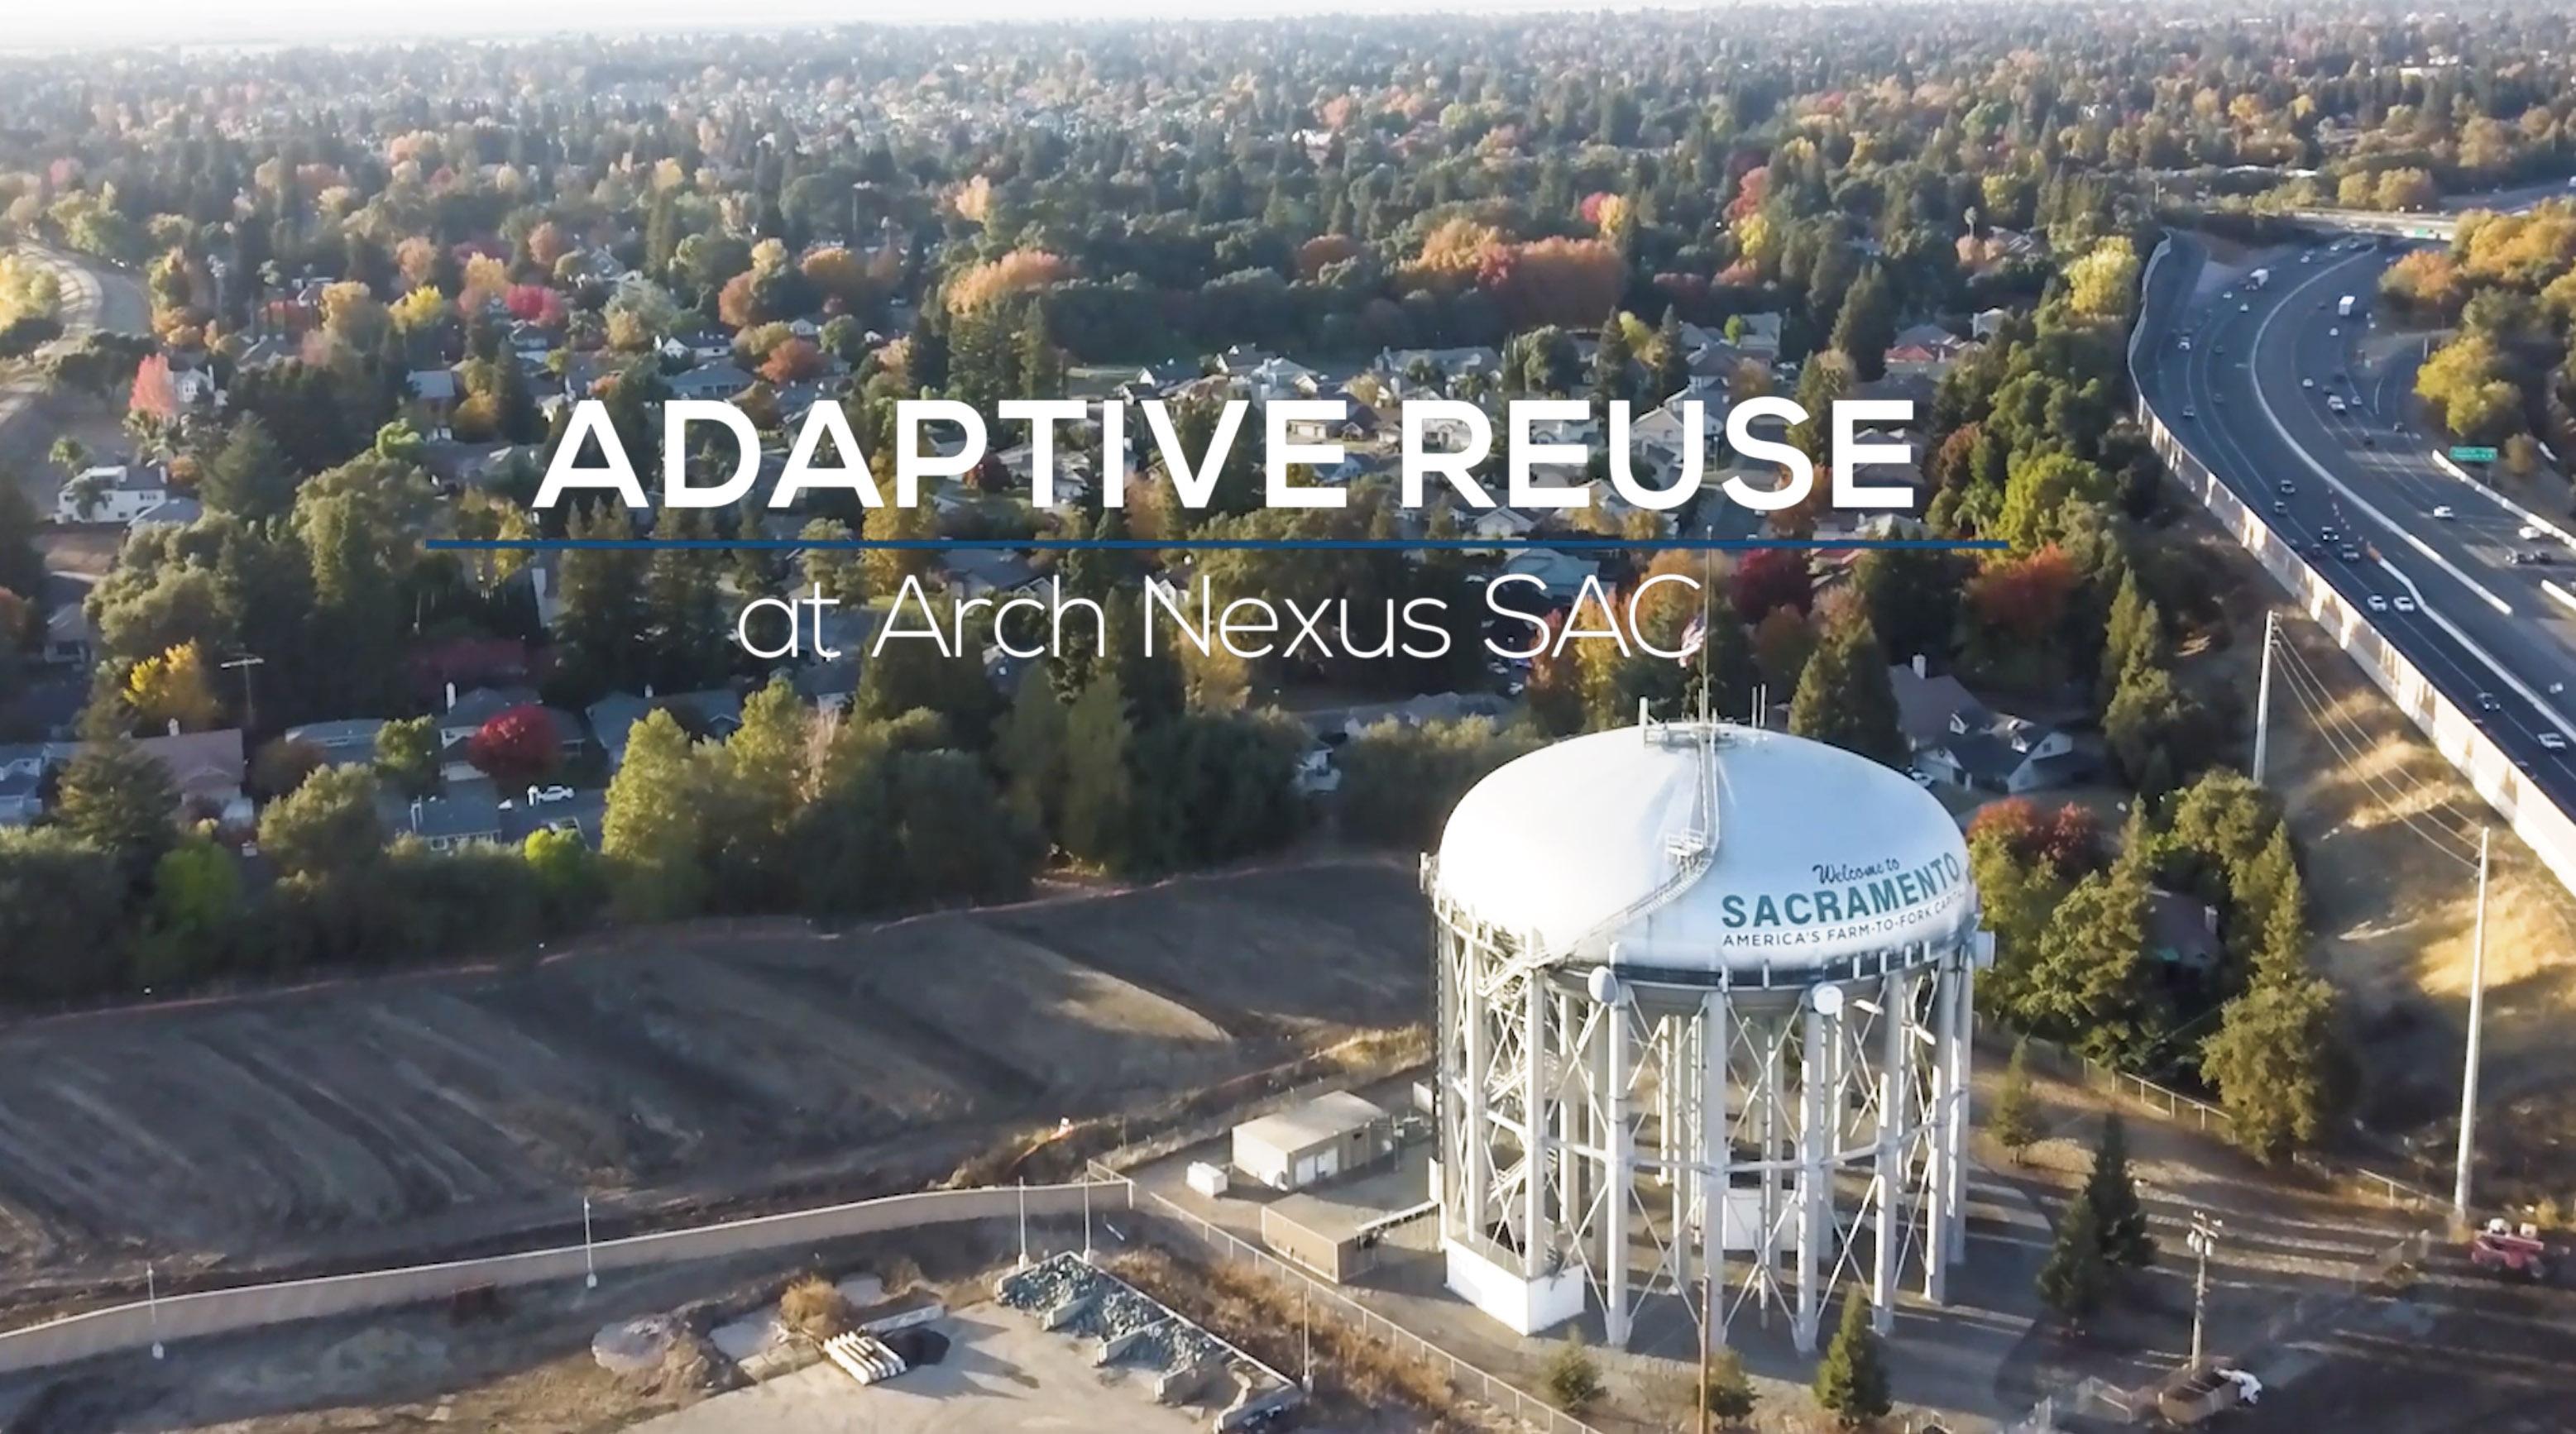 Arch Nexus, Sacramento, CA